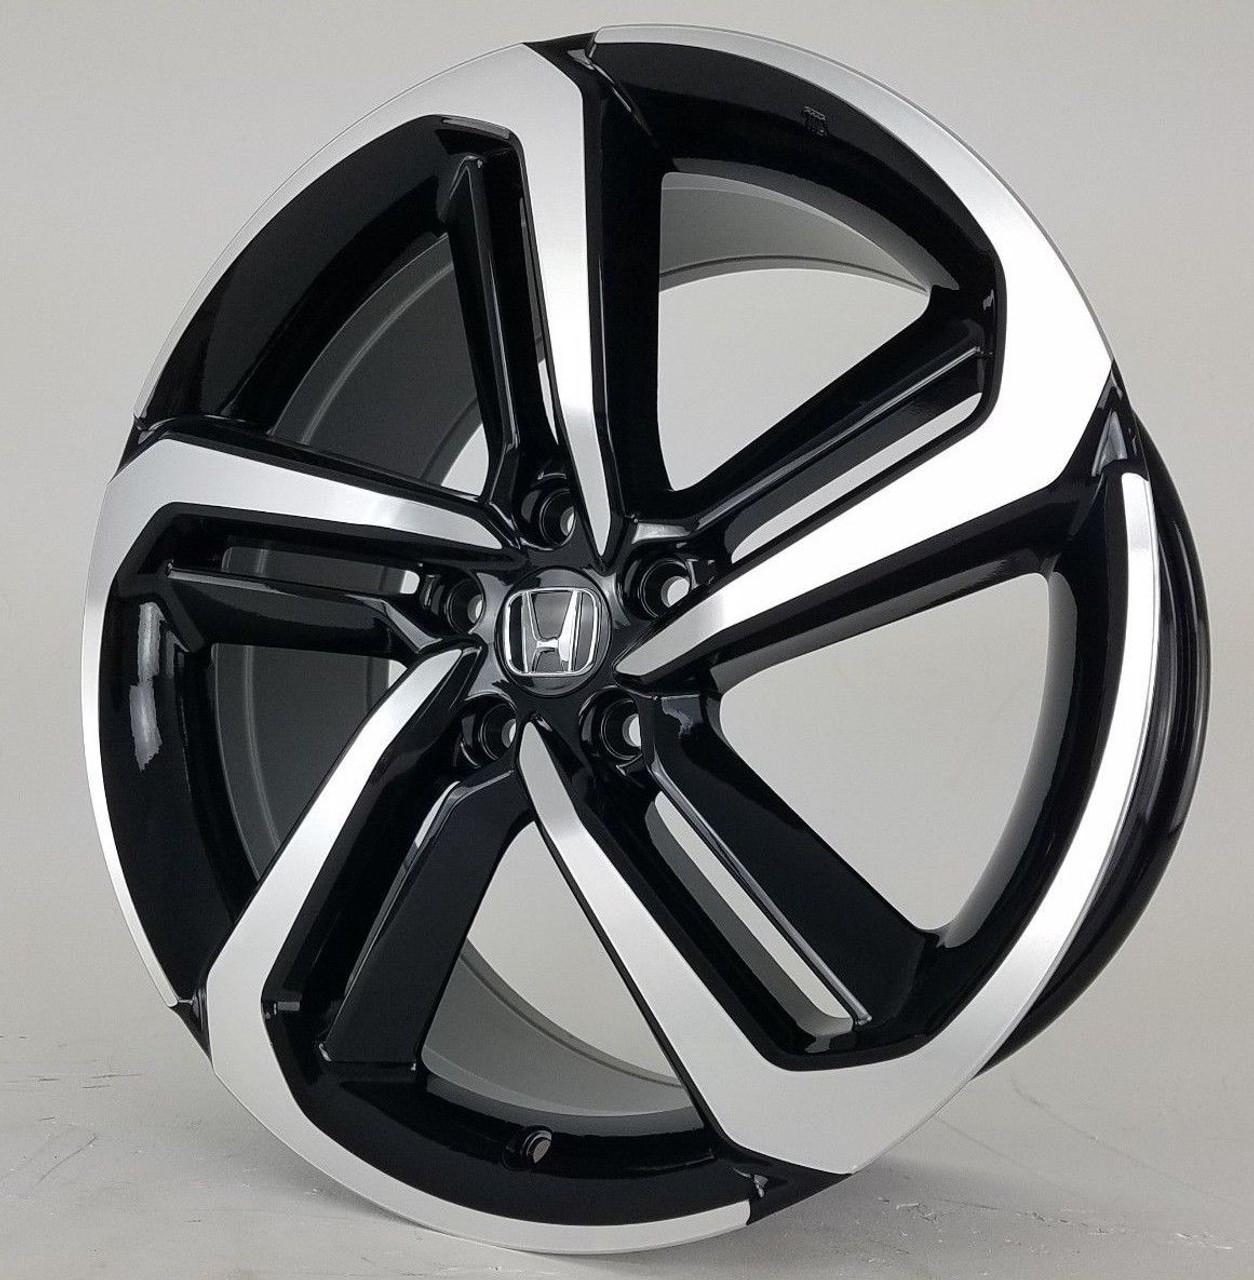 19 2018 19 Fits Honda Accord Sport Civic Si Exl Acura Black Machined Wheels Set Of 4 19x8 5 Rims Stock Wheel Solutions